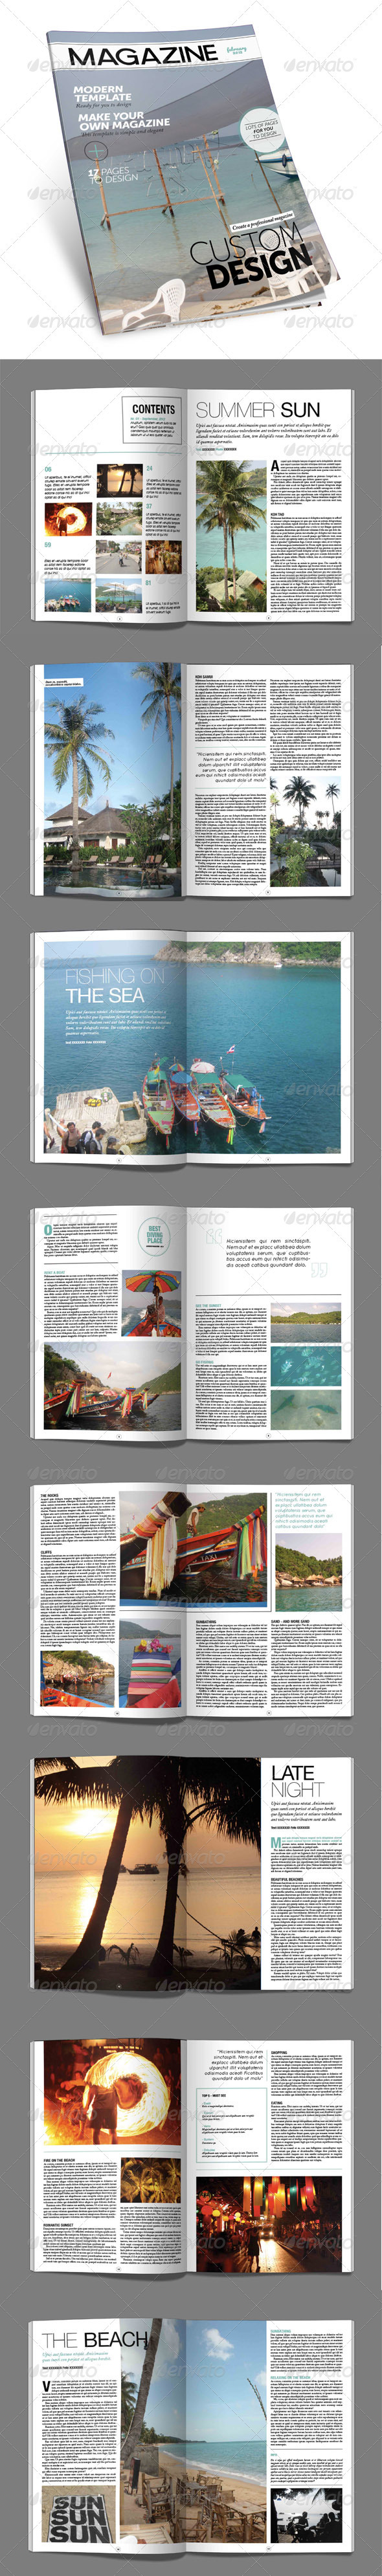 Blue Monkey Media - Magazine Template - Magazines Print Templates